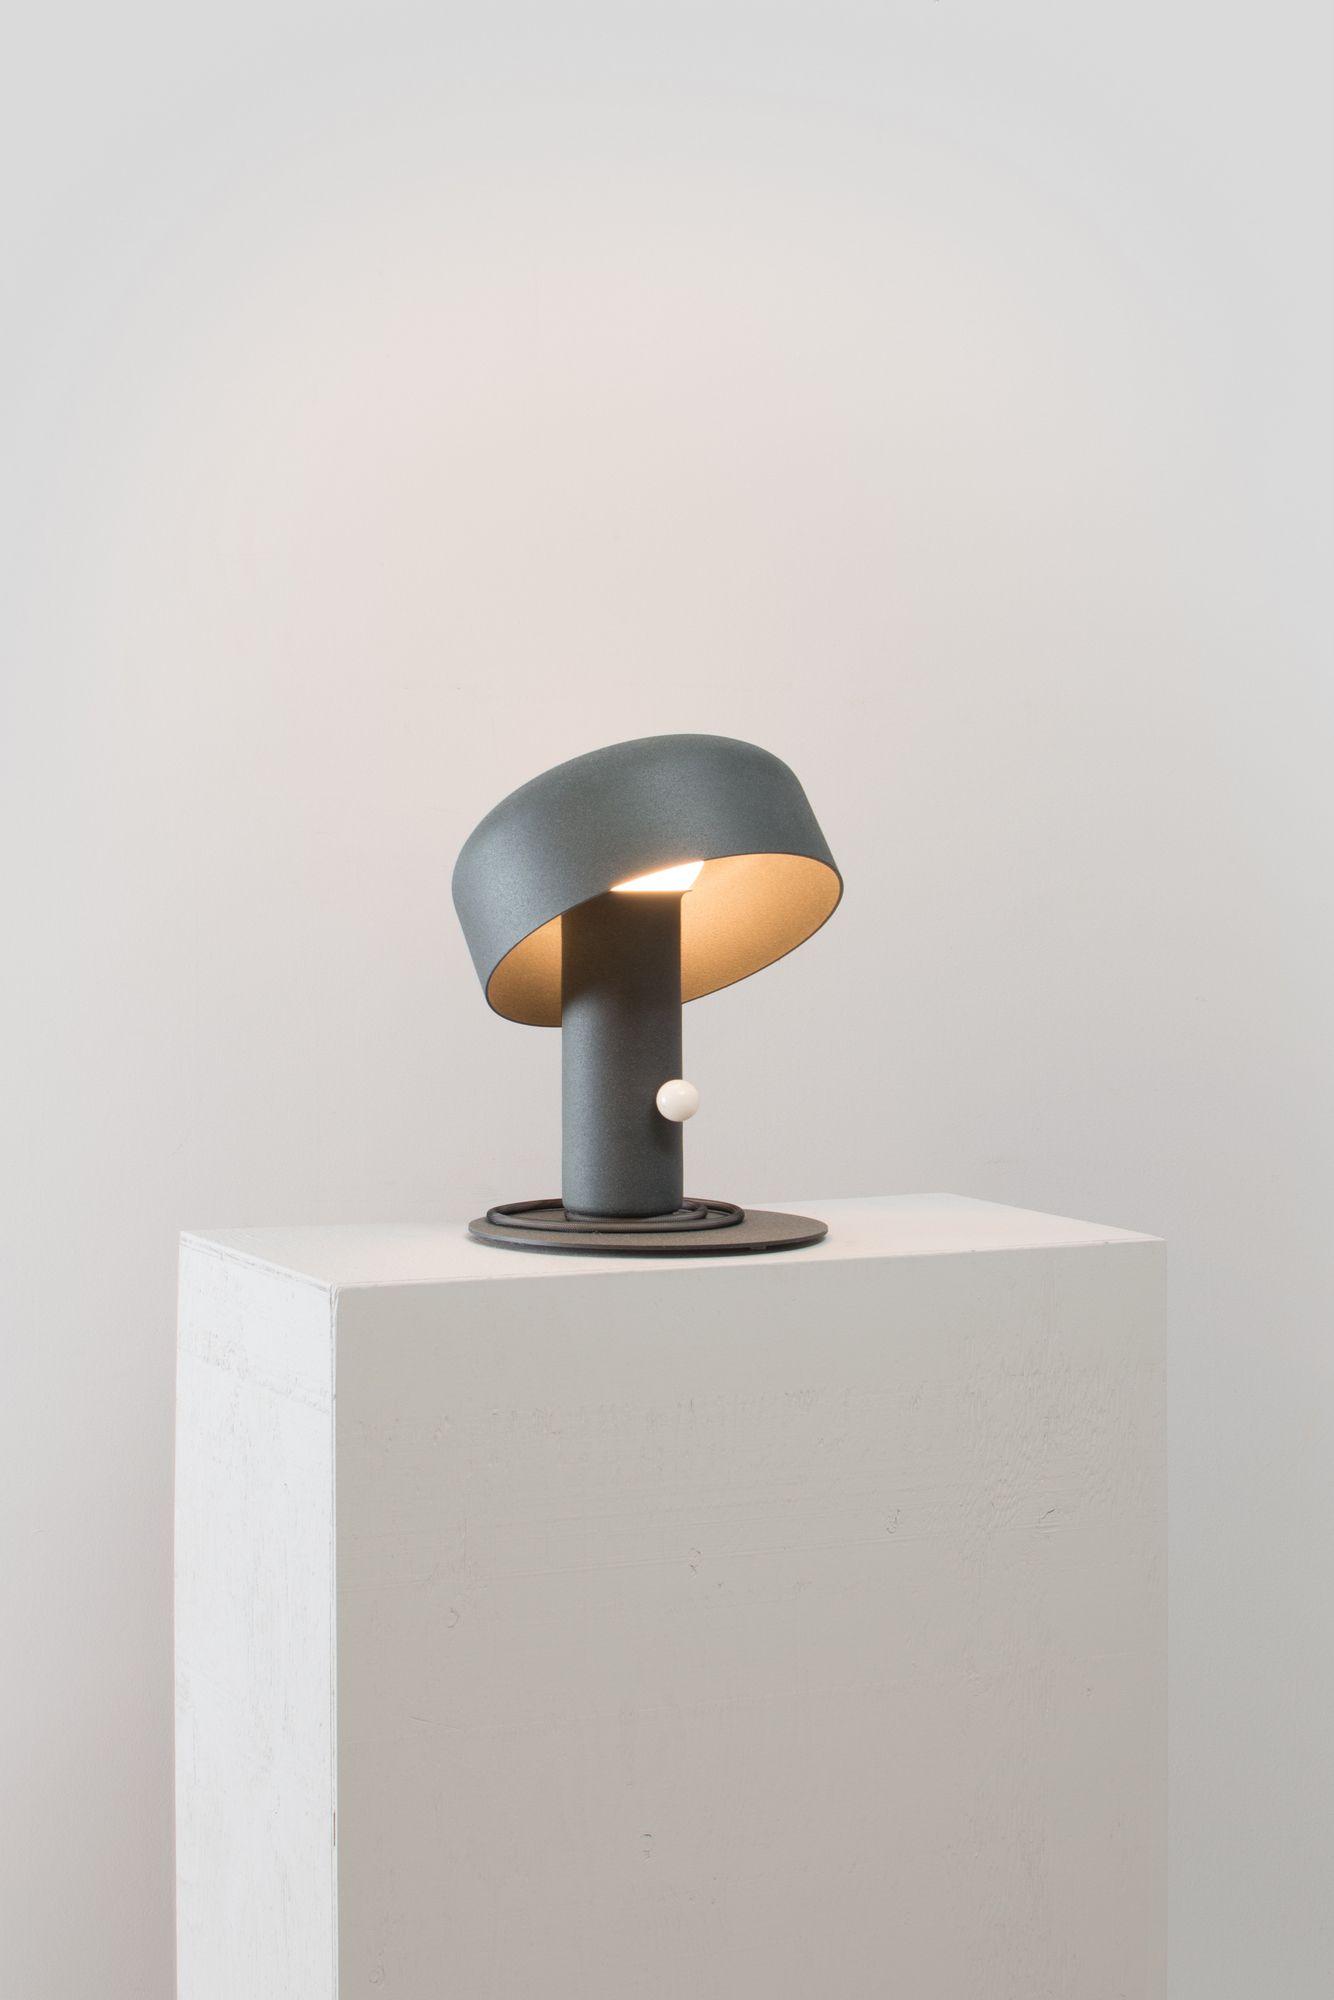 Direct Indirect Light Desk Lamp Pivot By Andlight Design Lukas Peet Table Lamp Design Desk Lamp Lamp